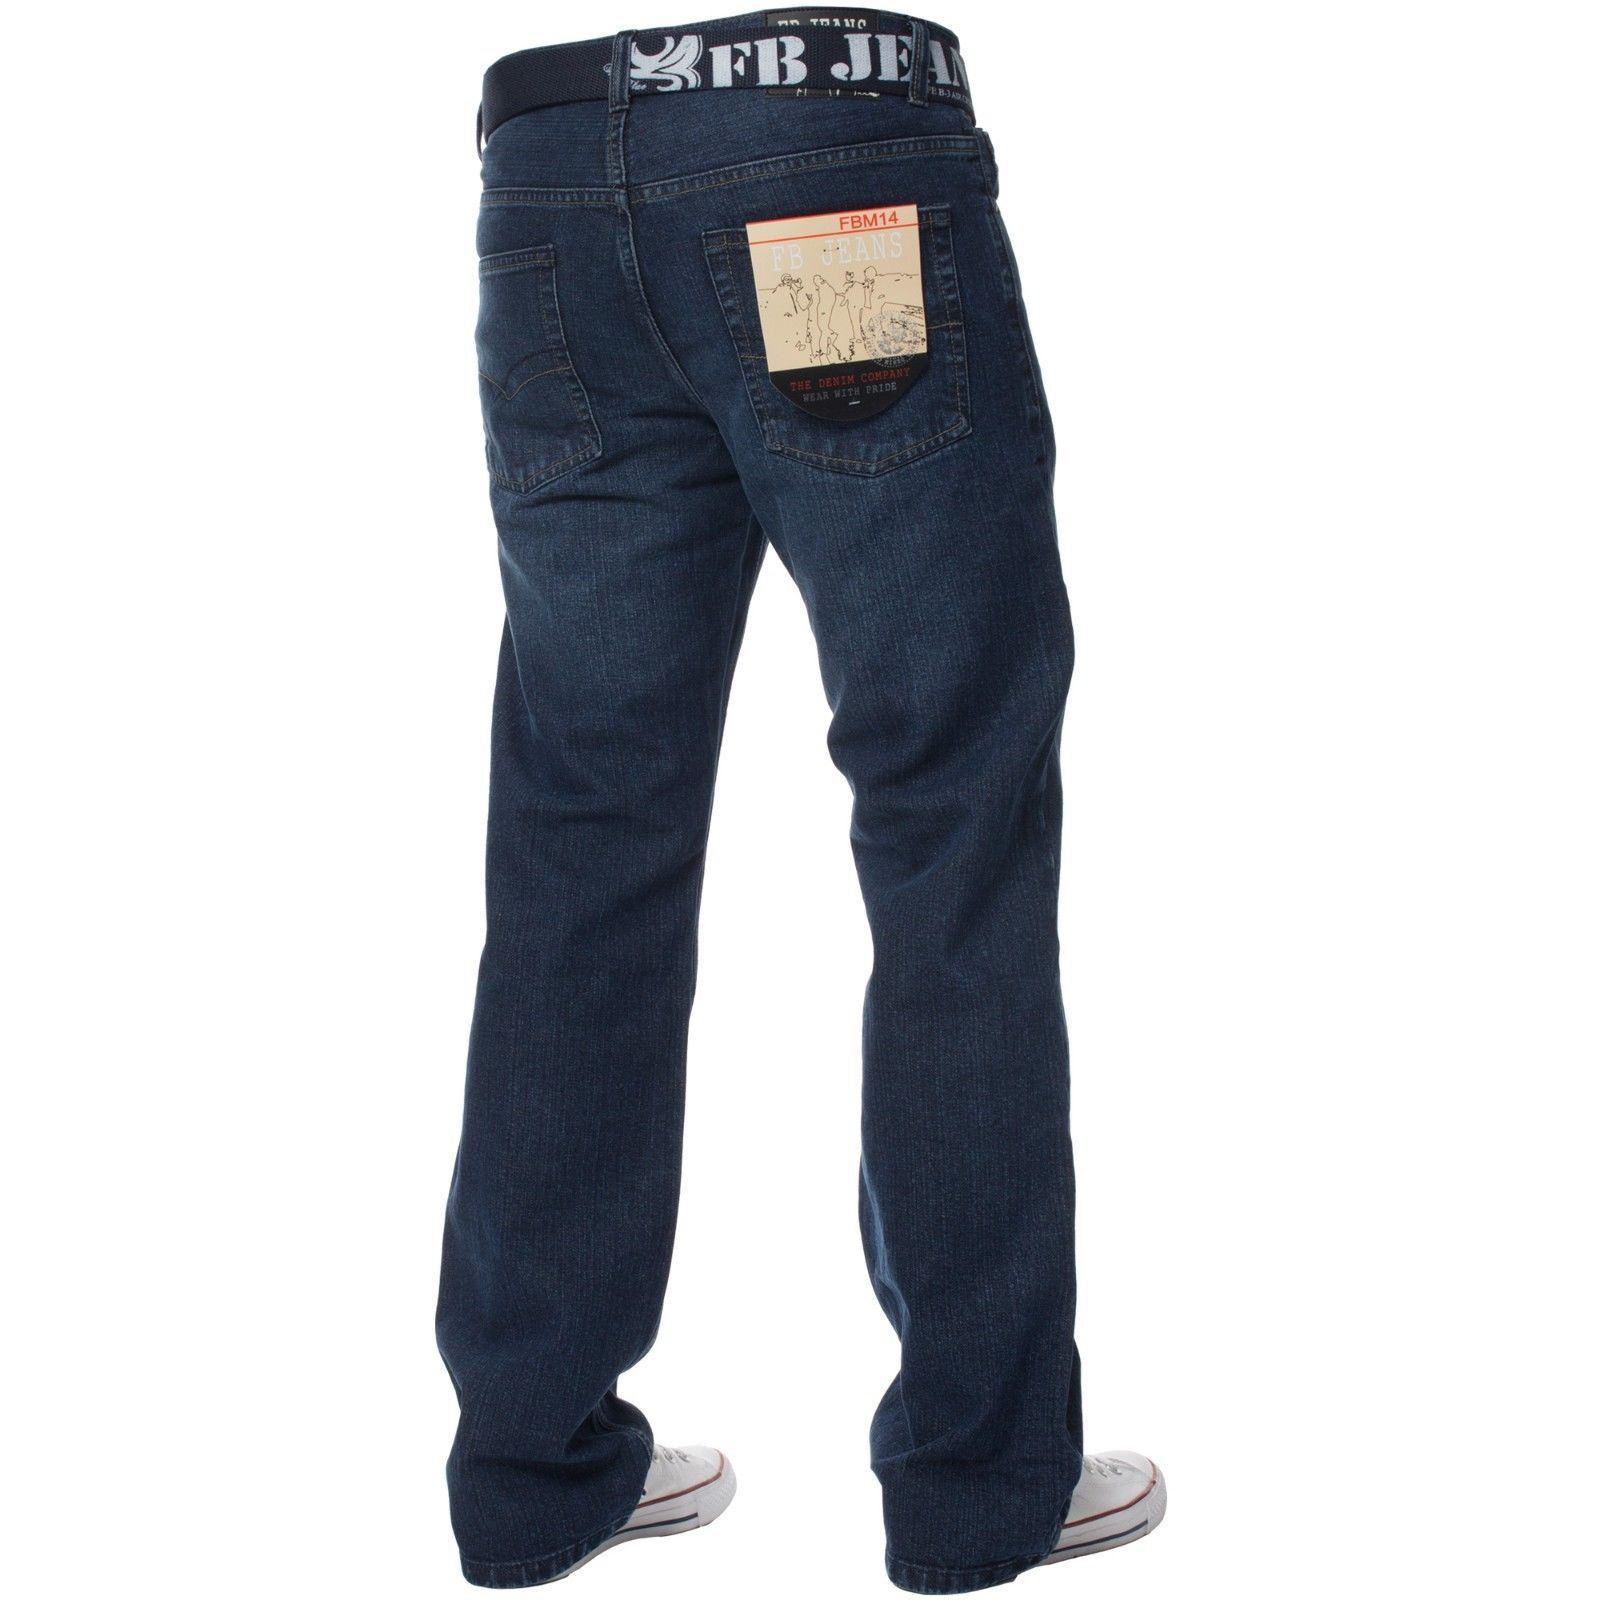 Mens-Straight-Leg-Jeans-Regular-Fit-Denim-Pants-Cotton-Free-Belt-All-Waist-Sizes thumbnail 3